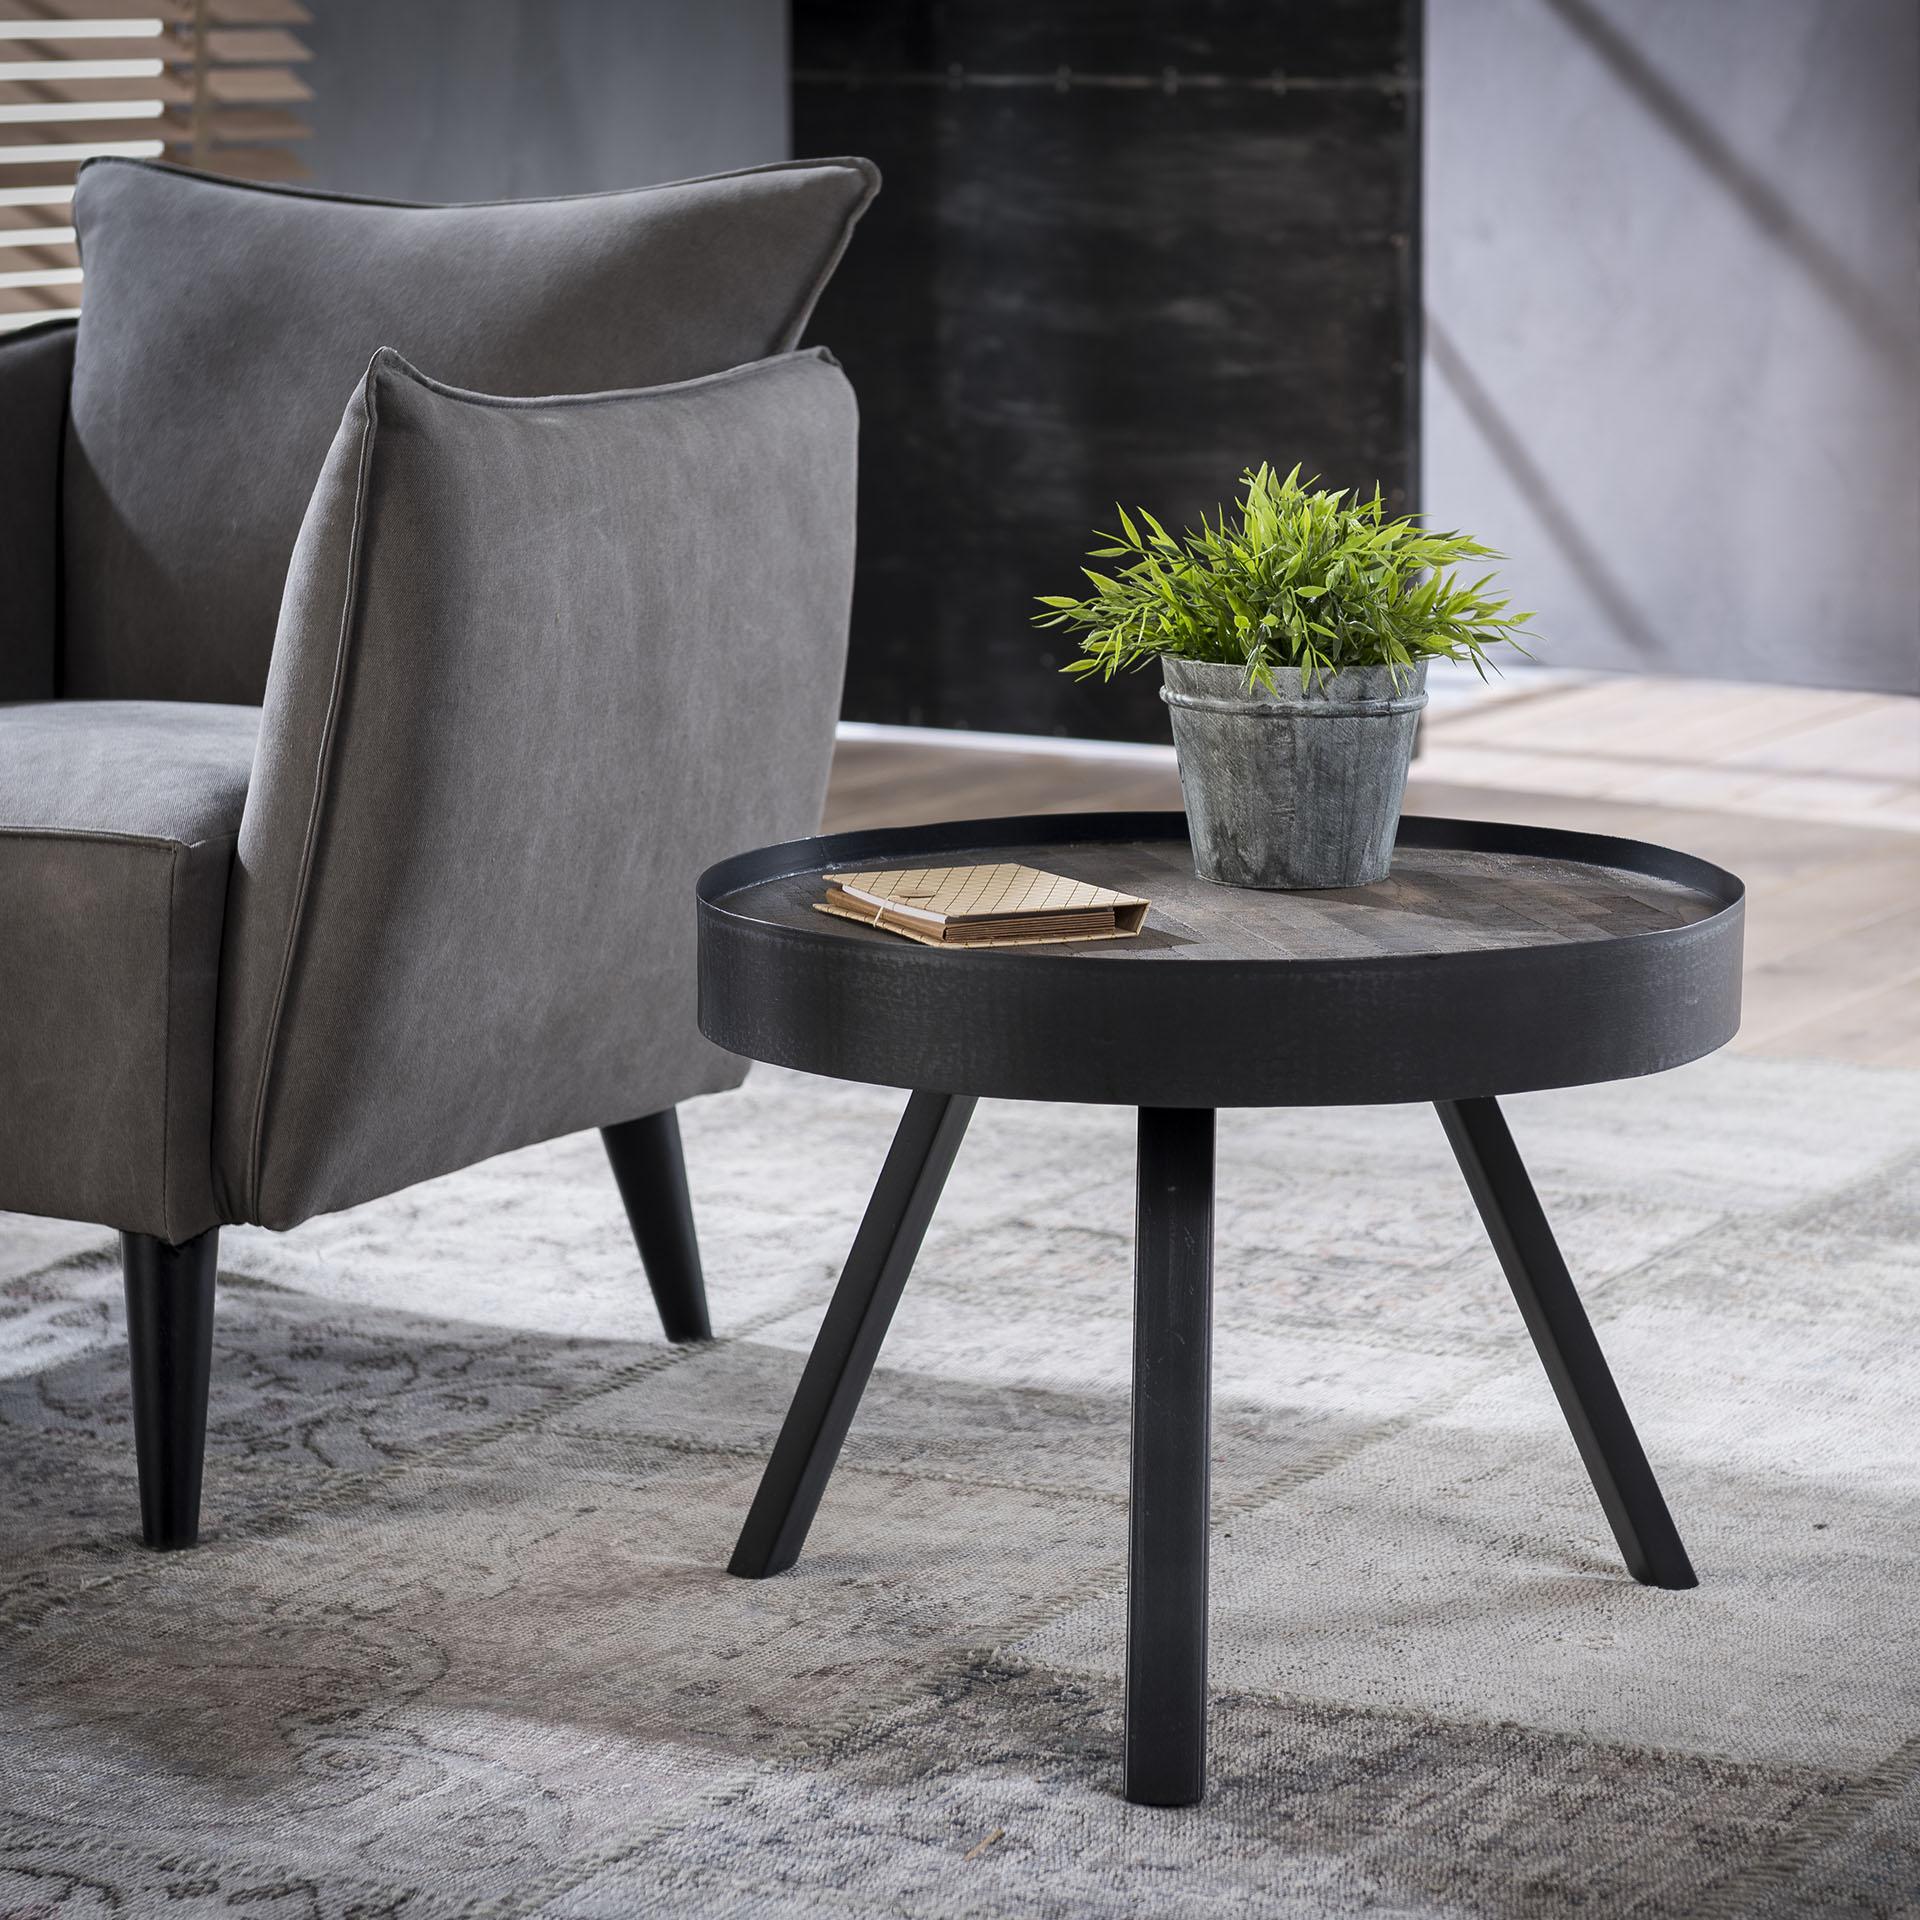 Root Catalog LifestyleFurn Ronde salontafel 'Teca Grey' met metalen rand, 60cm